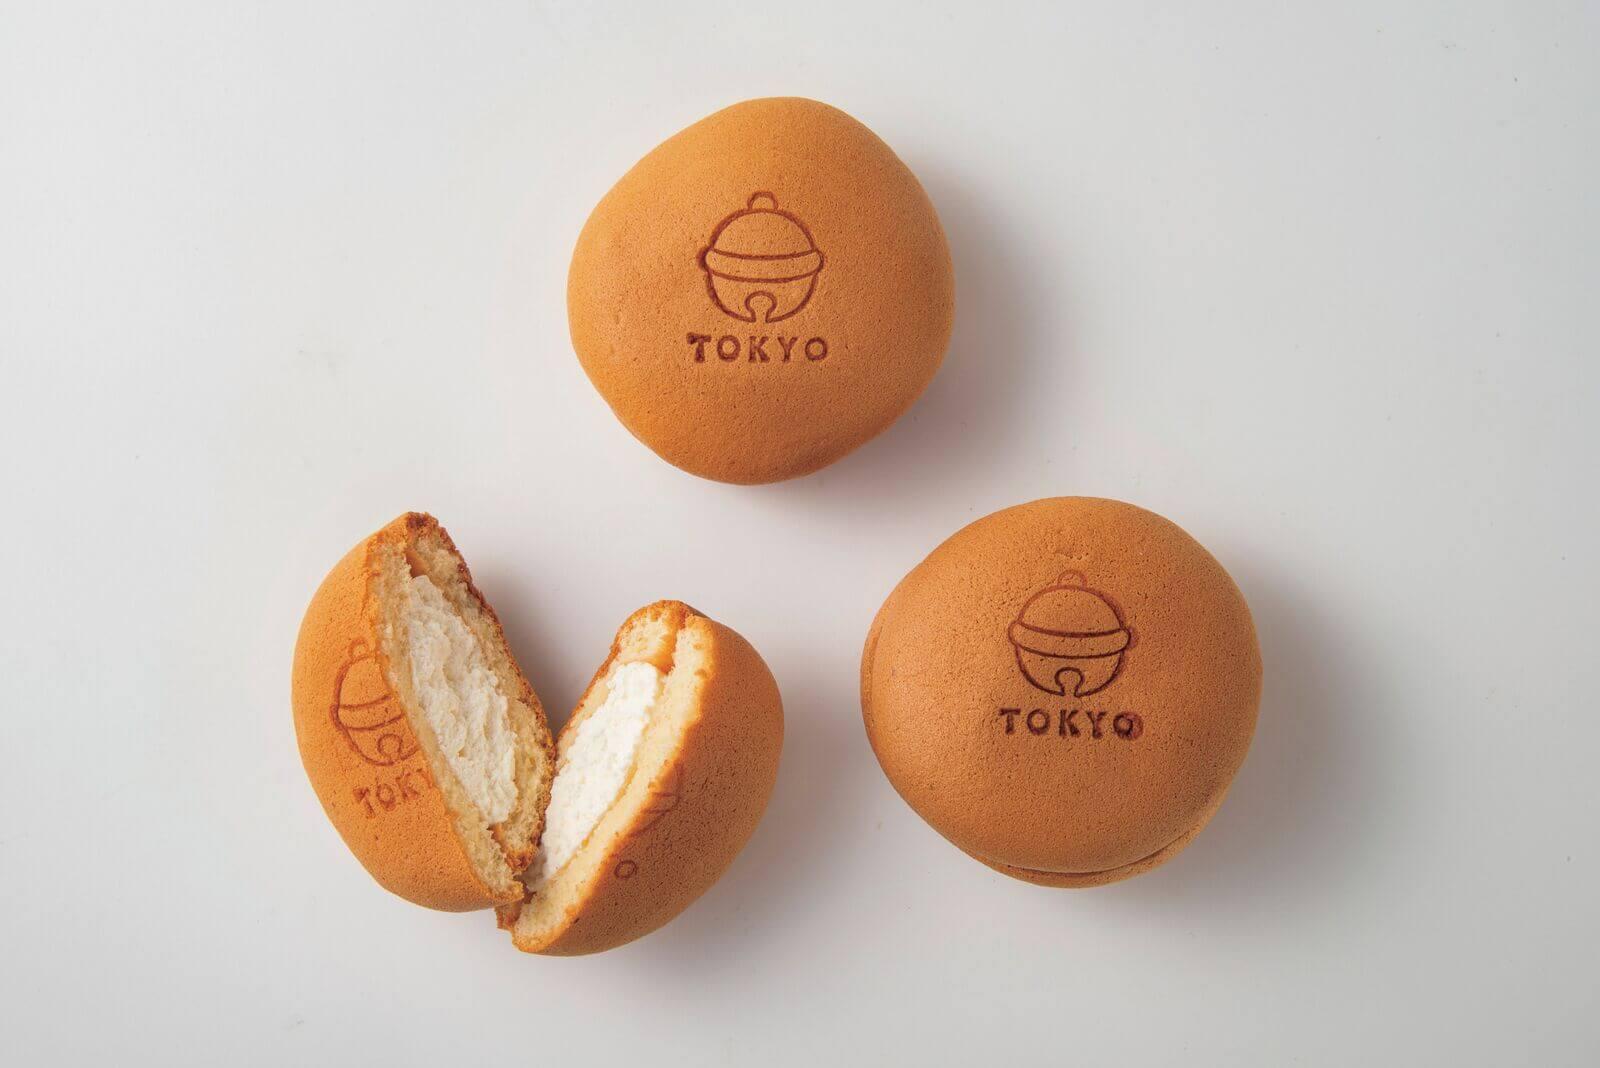 %e6%9d%b1%e4%ba%ac%e9%a7%85-%e3%81%8a%e5%9c%9f%e7%94%a3-tokyo-station-souvenir-2